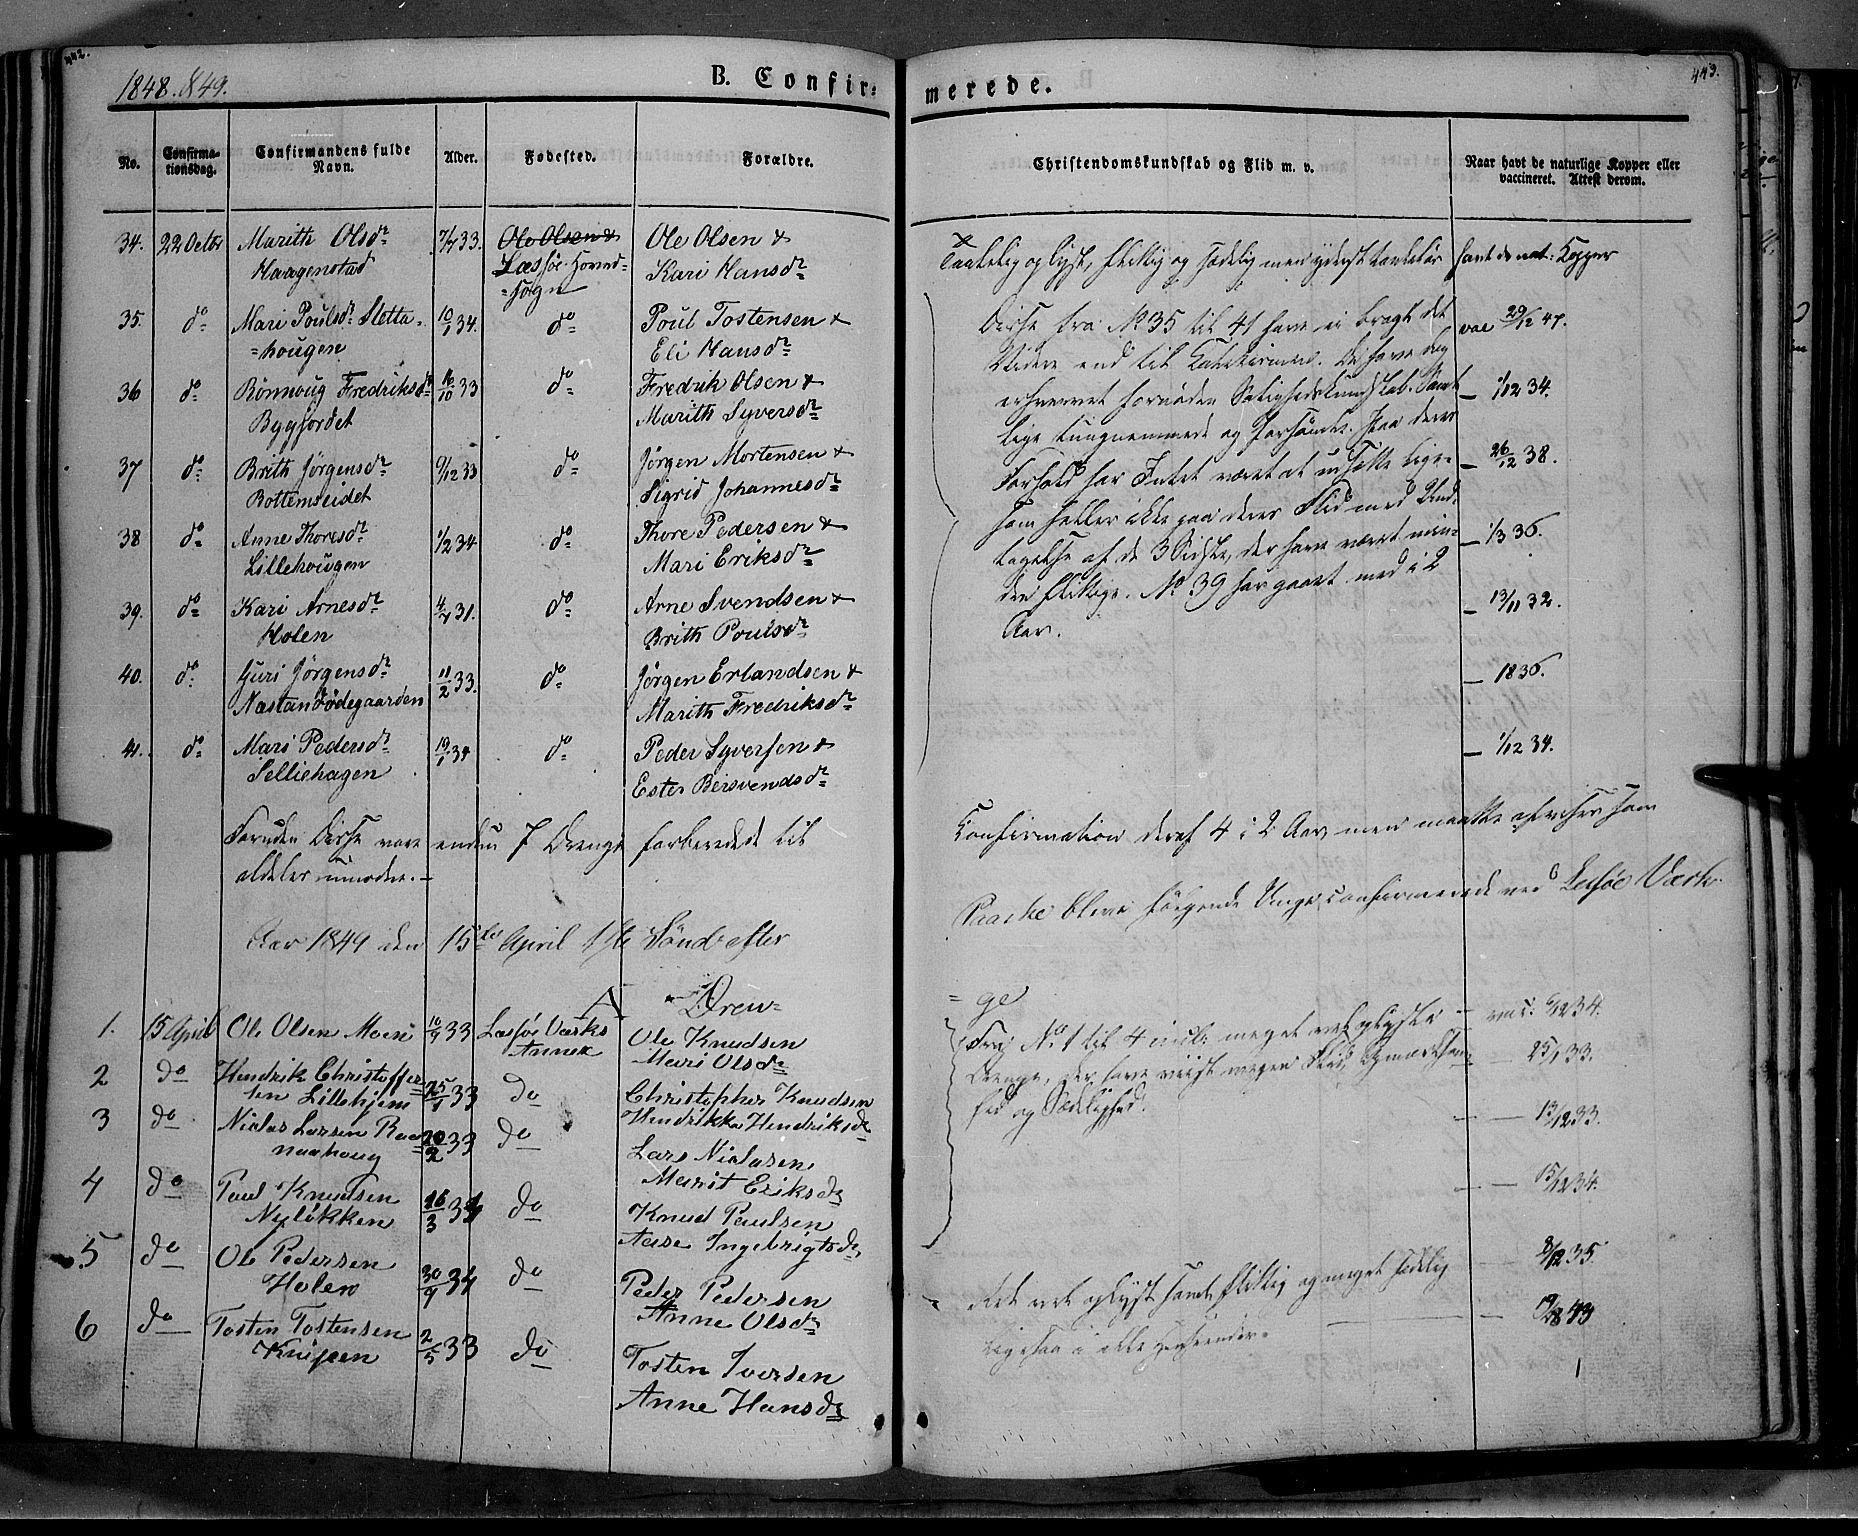 SAH, Lesja prestekontor, Ministerialbok nr. 6A, 1843-1854, s. 442-443